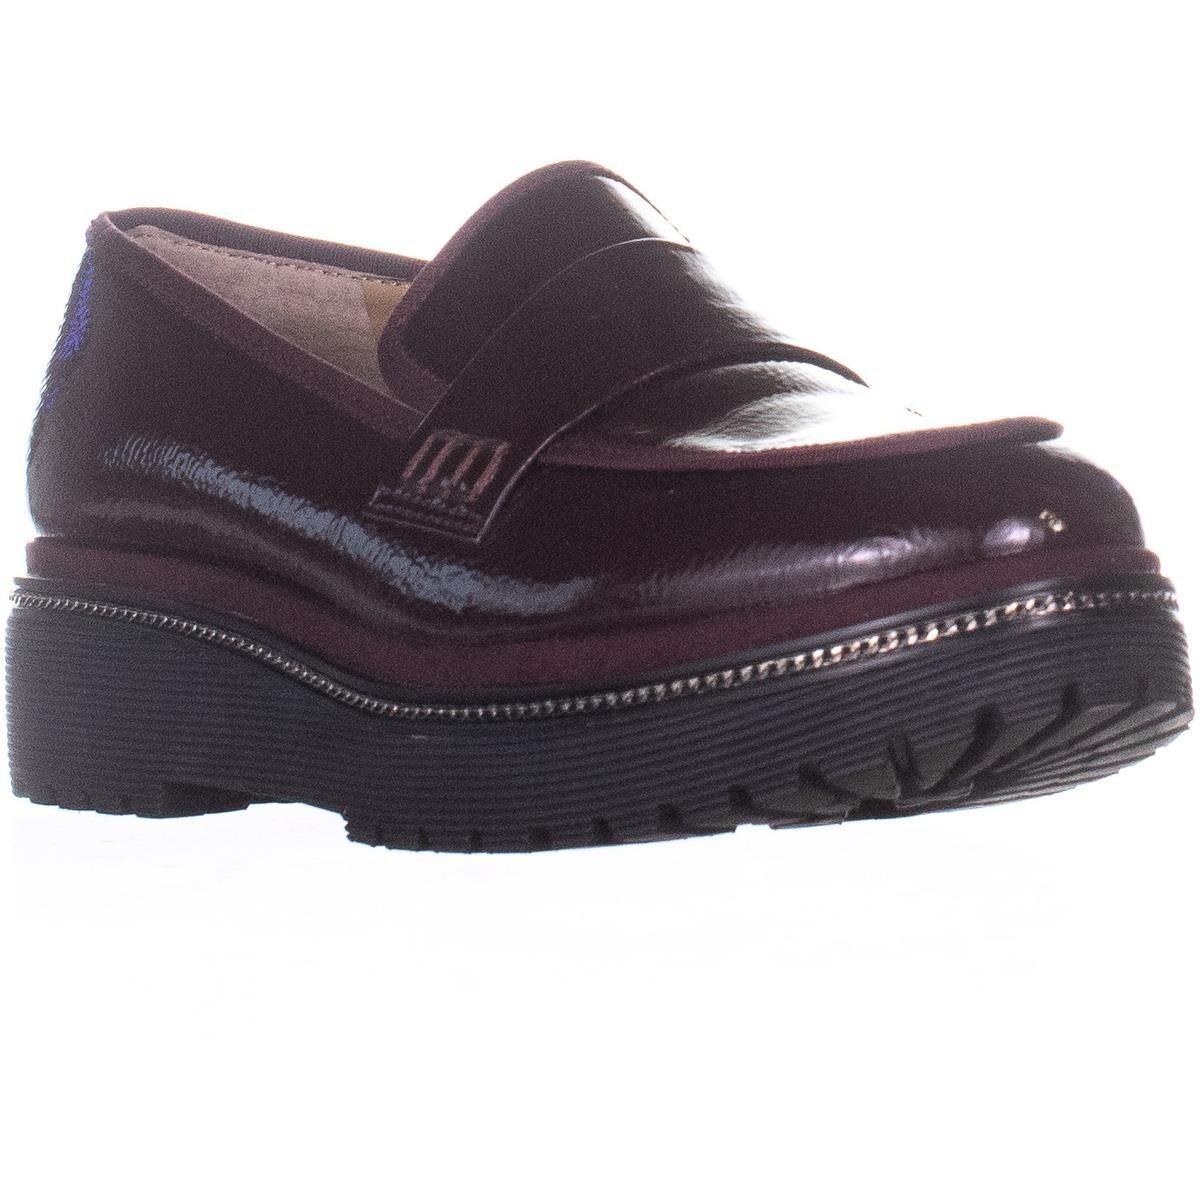 Franco Sarto Shelton Platform Loafers